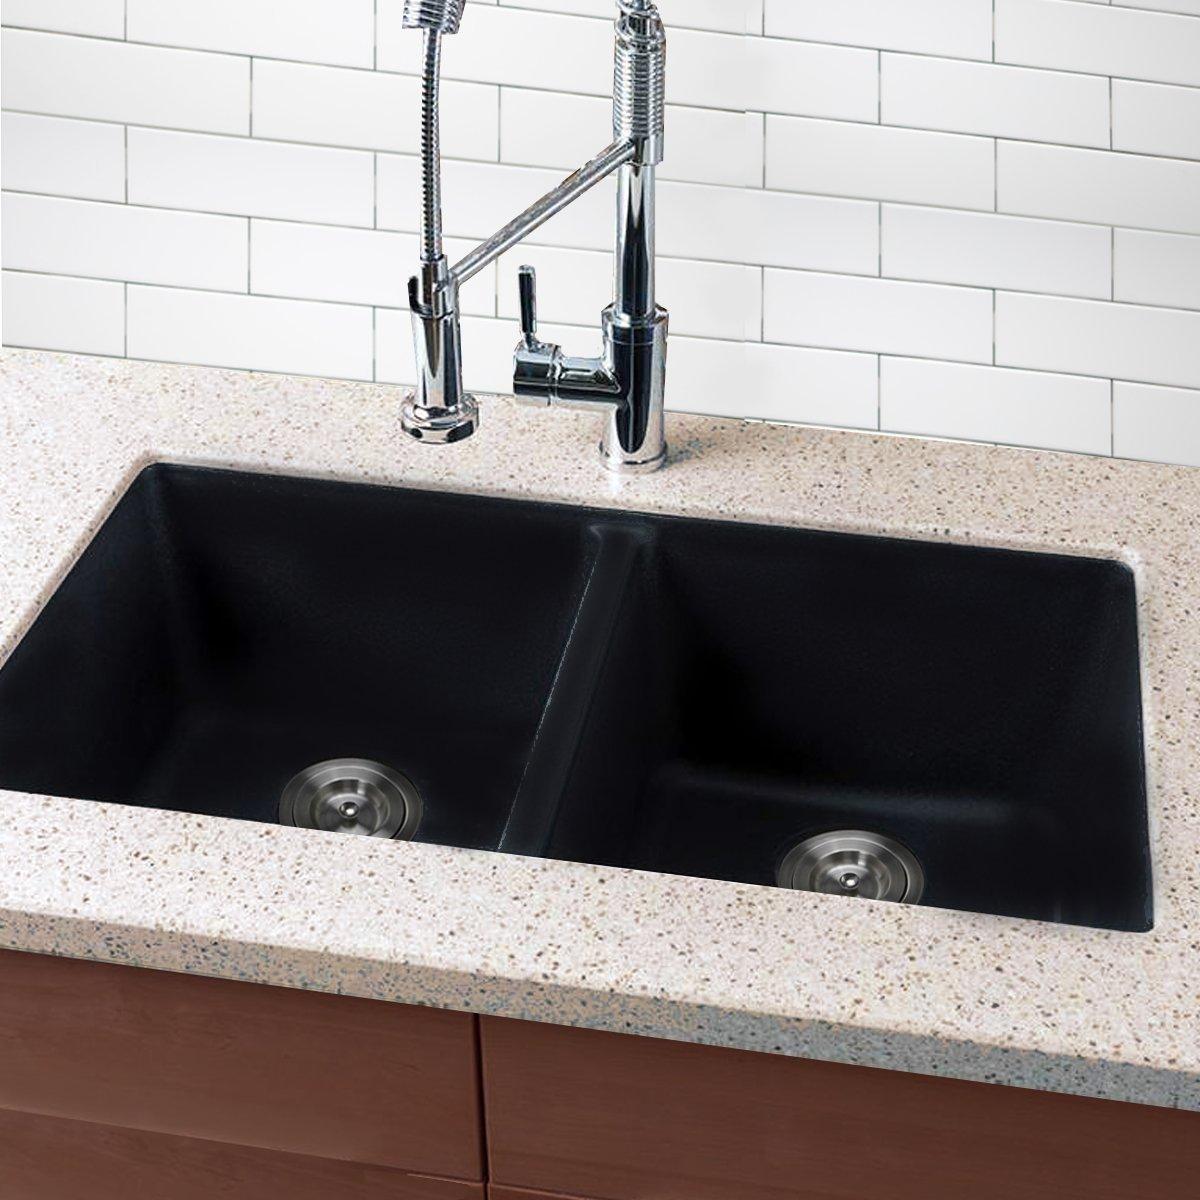 Marvelous Kitchen Sink Franke Indonesia Download Free Architecture Designs Scobabritishbridgeorg